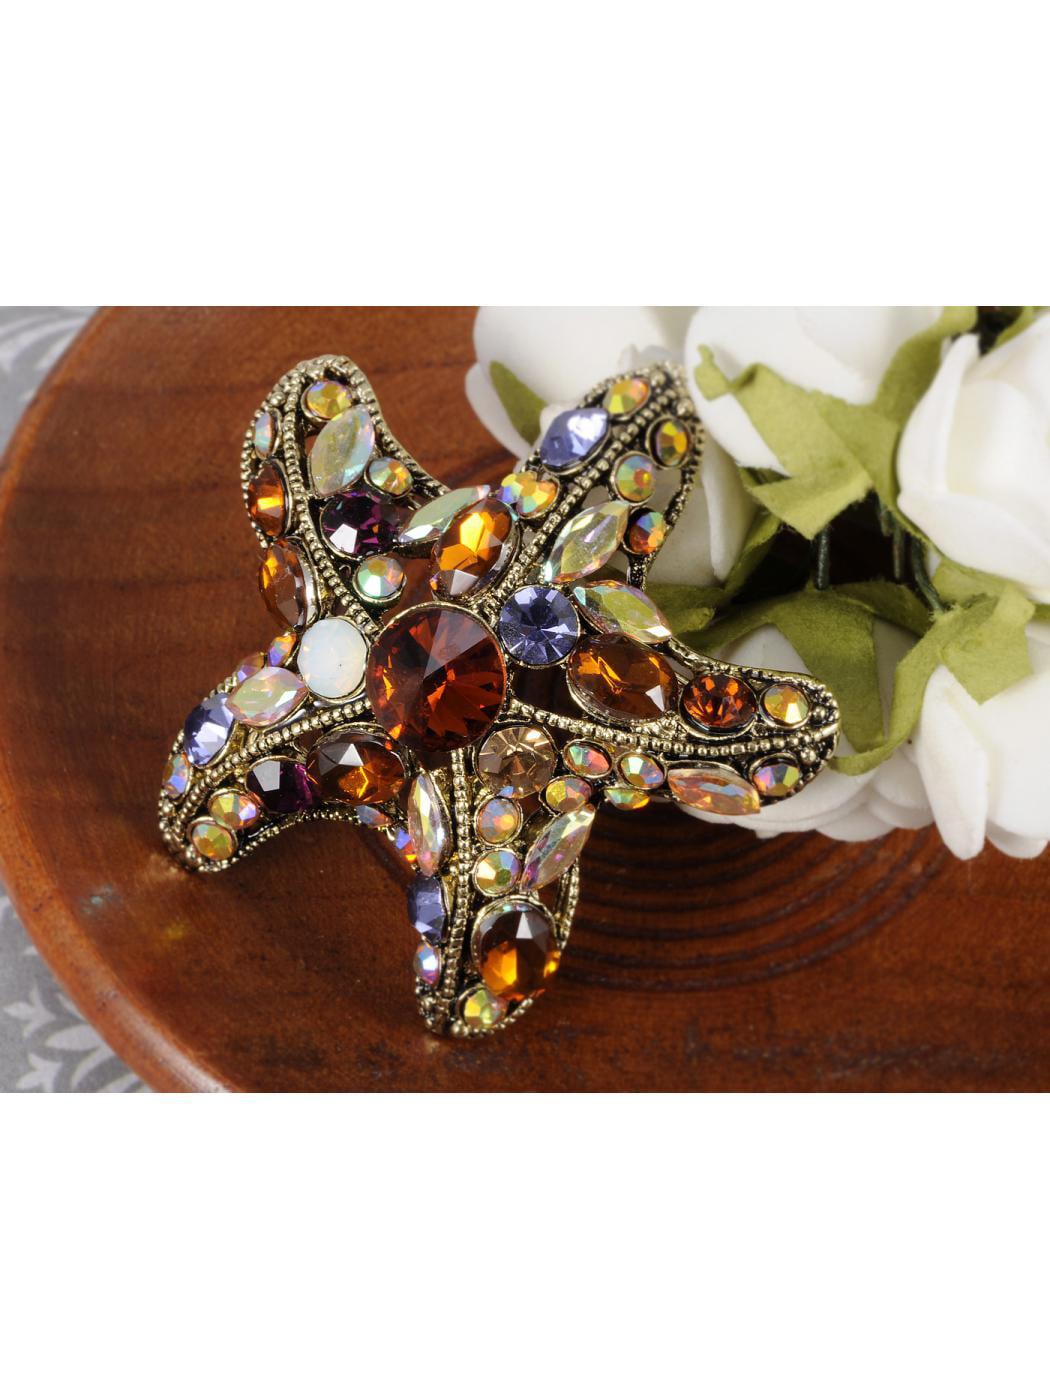 Colorful Crystal Rhinestone Gold Tone Ocean Sea Starfish Star Shape Pin Brooch by